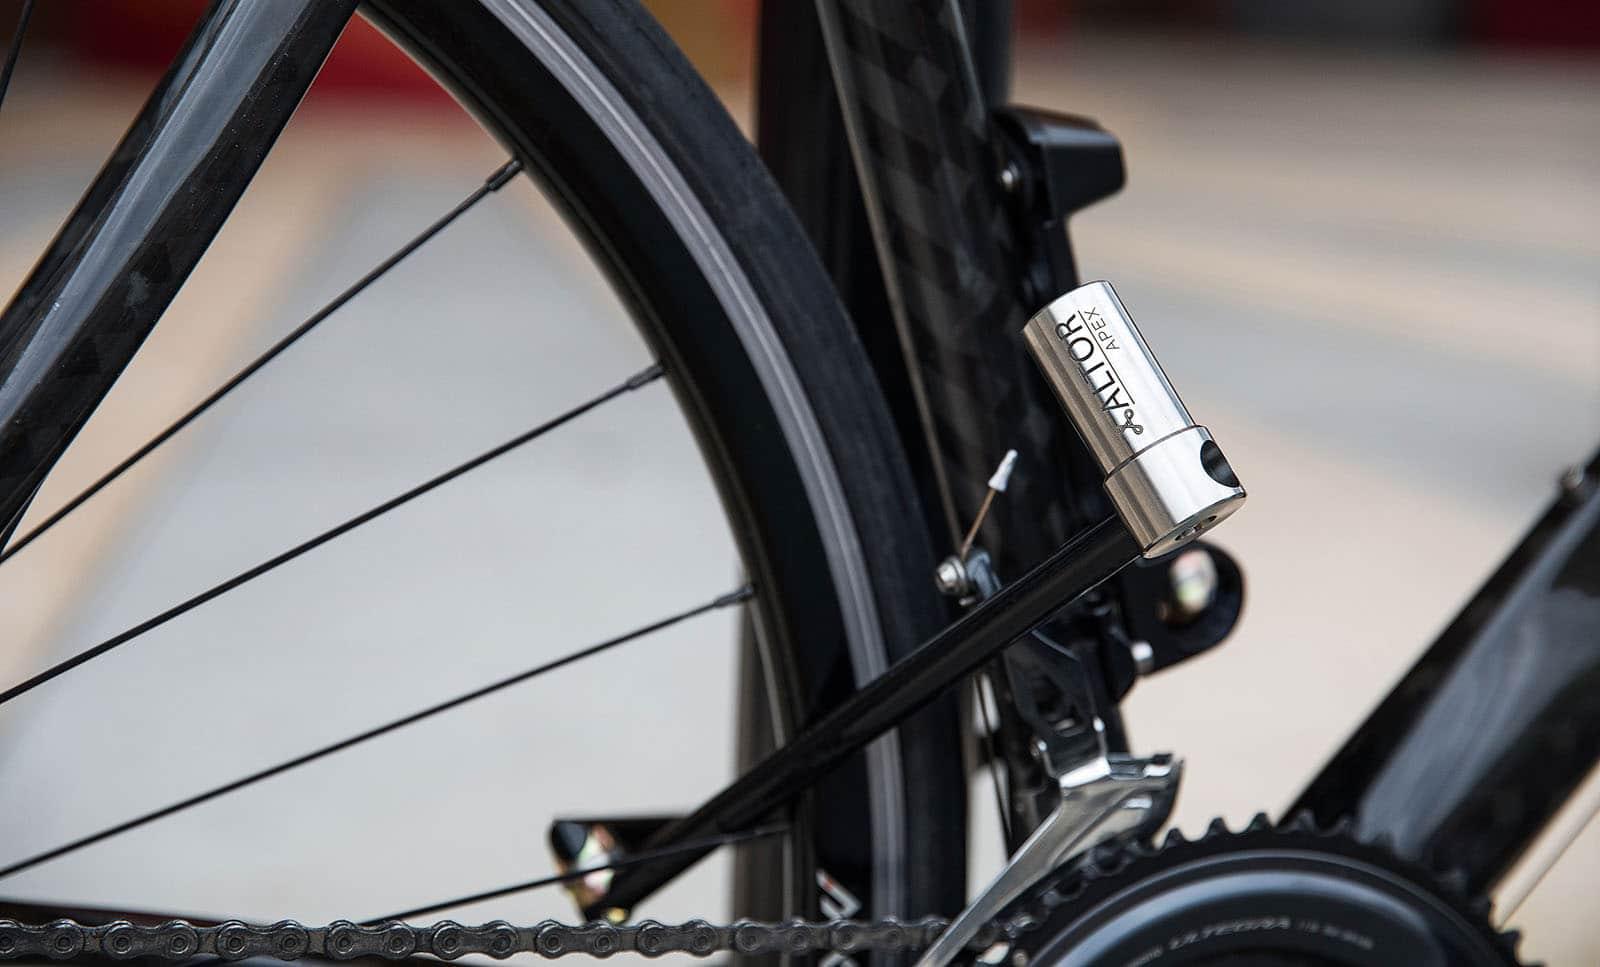 altorlock apex ti bike lock